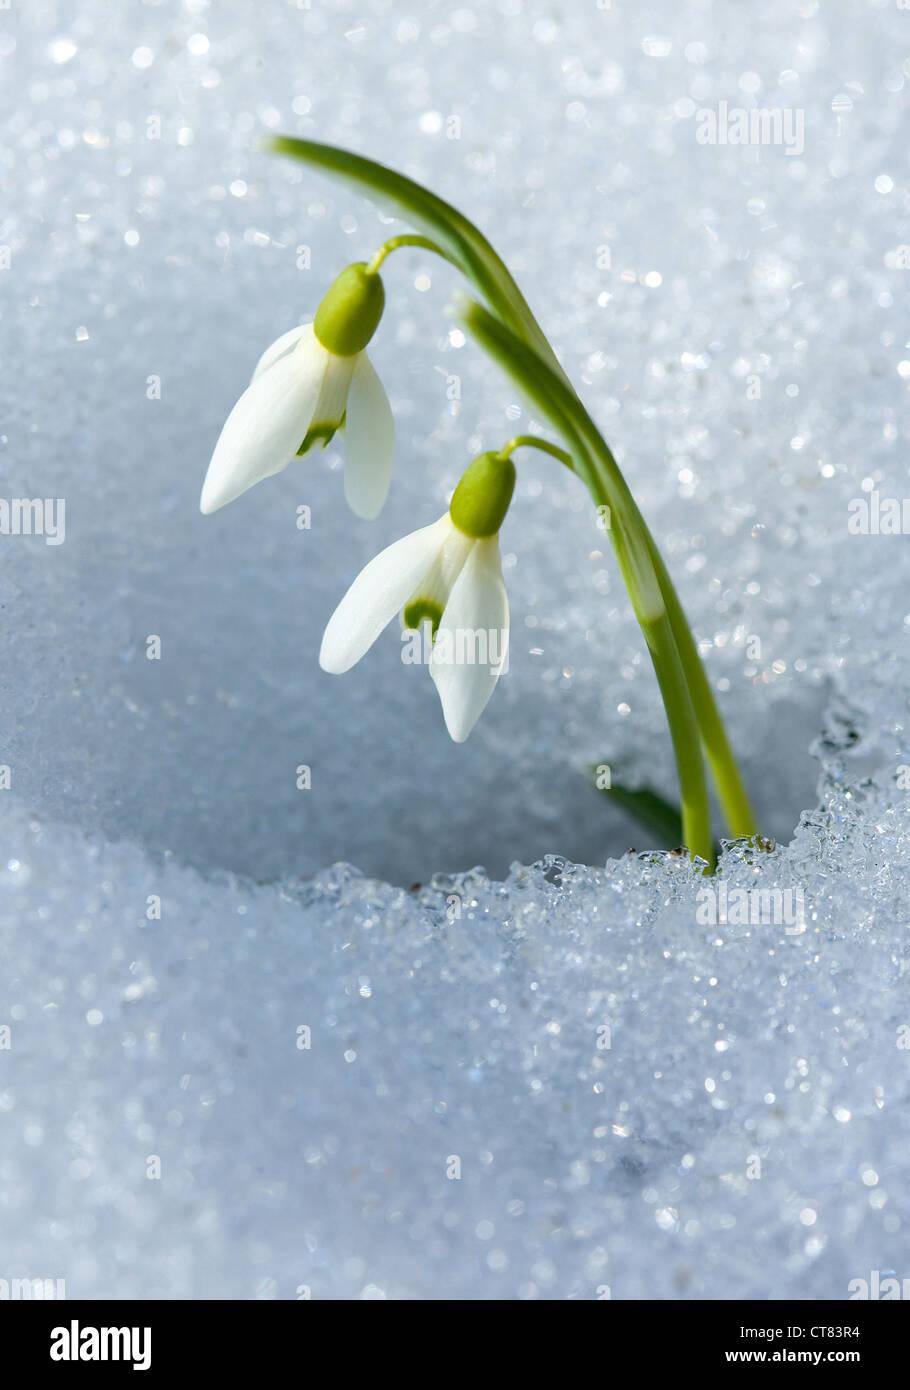 Recording icon - Snowdrop - Stock Image